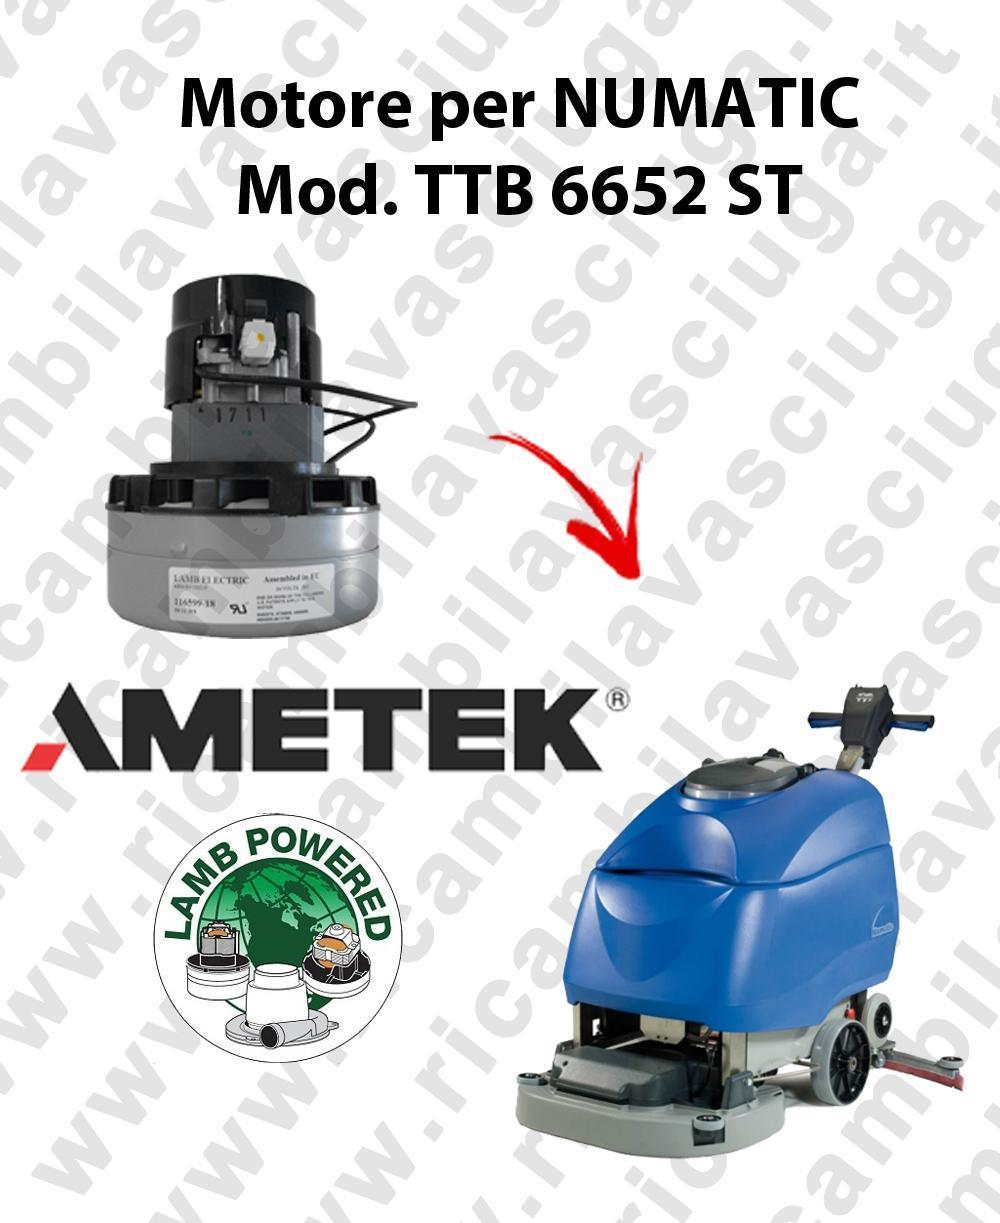 TTB 6652 ST motor de aspiración AMETEK fregadora NUMATIC